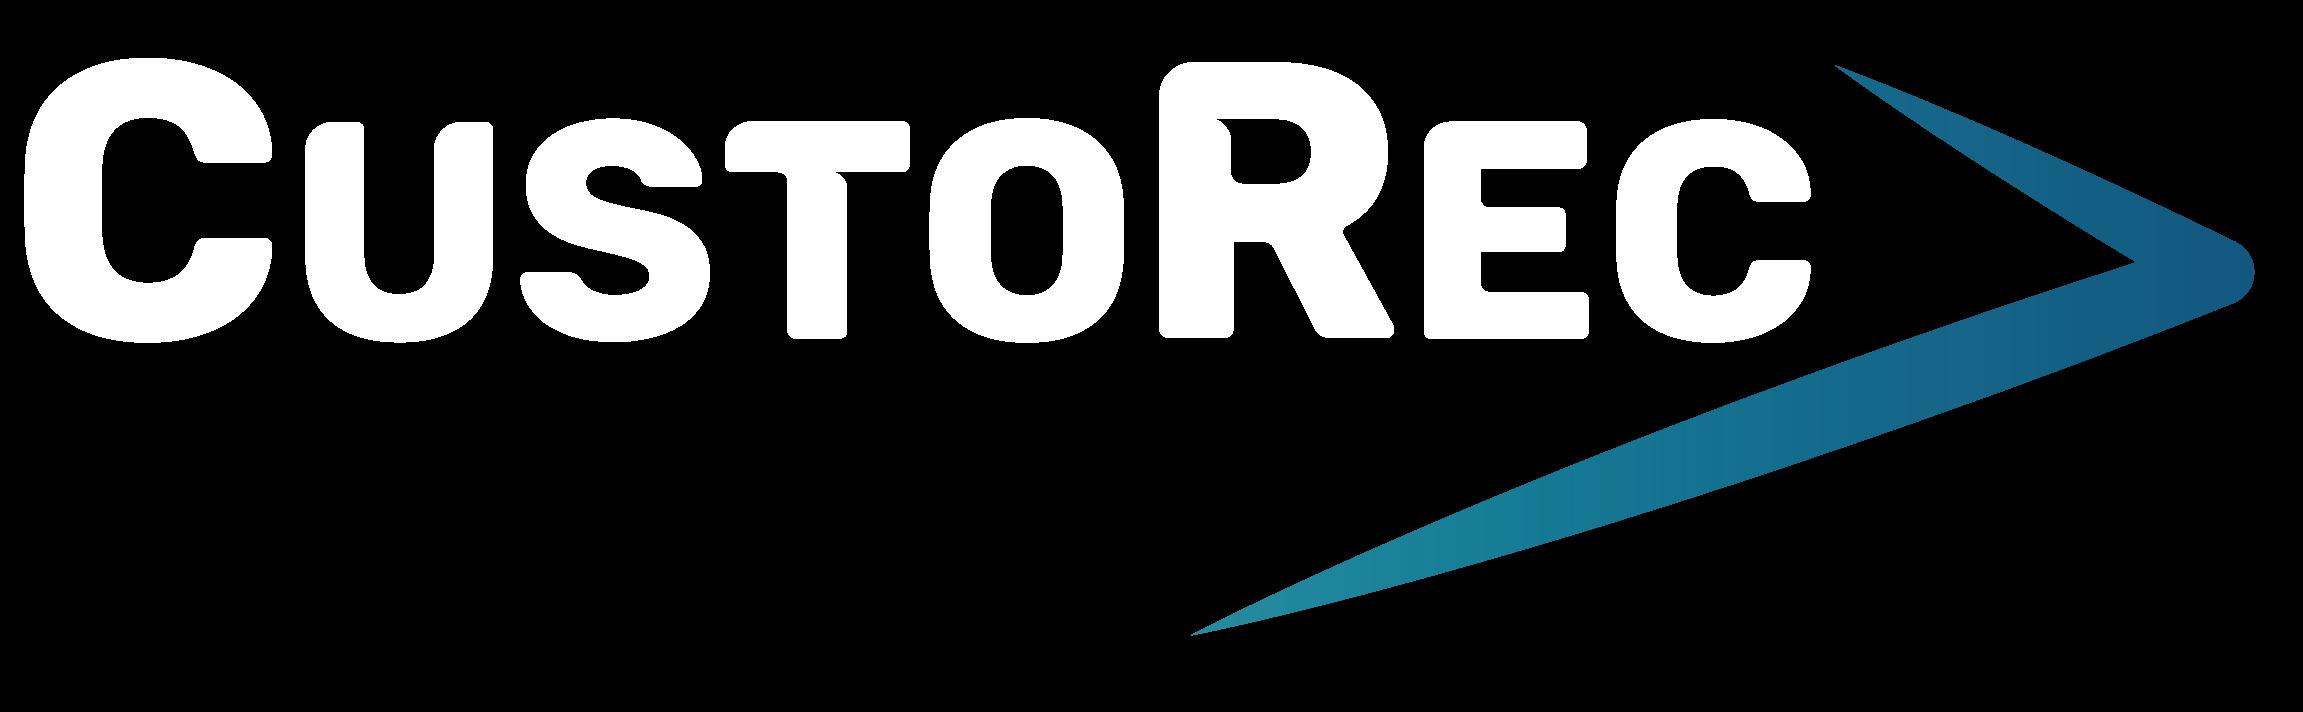 CustoRec